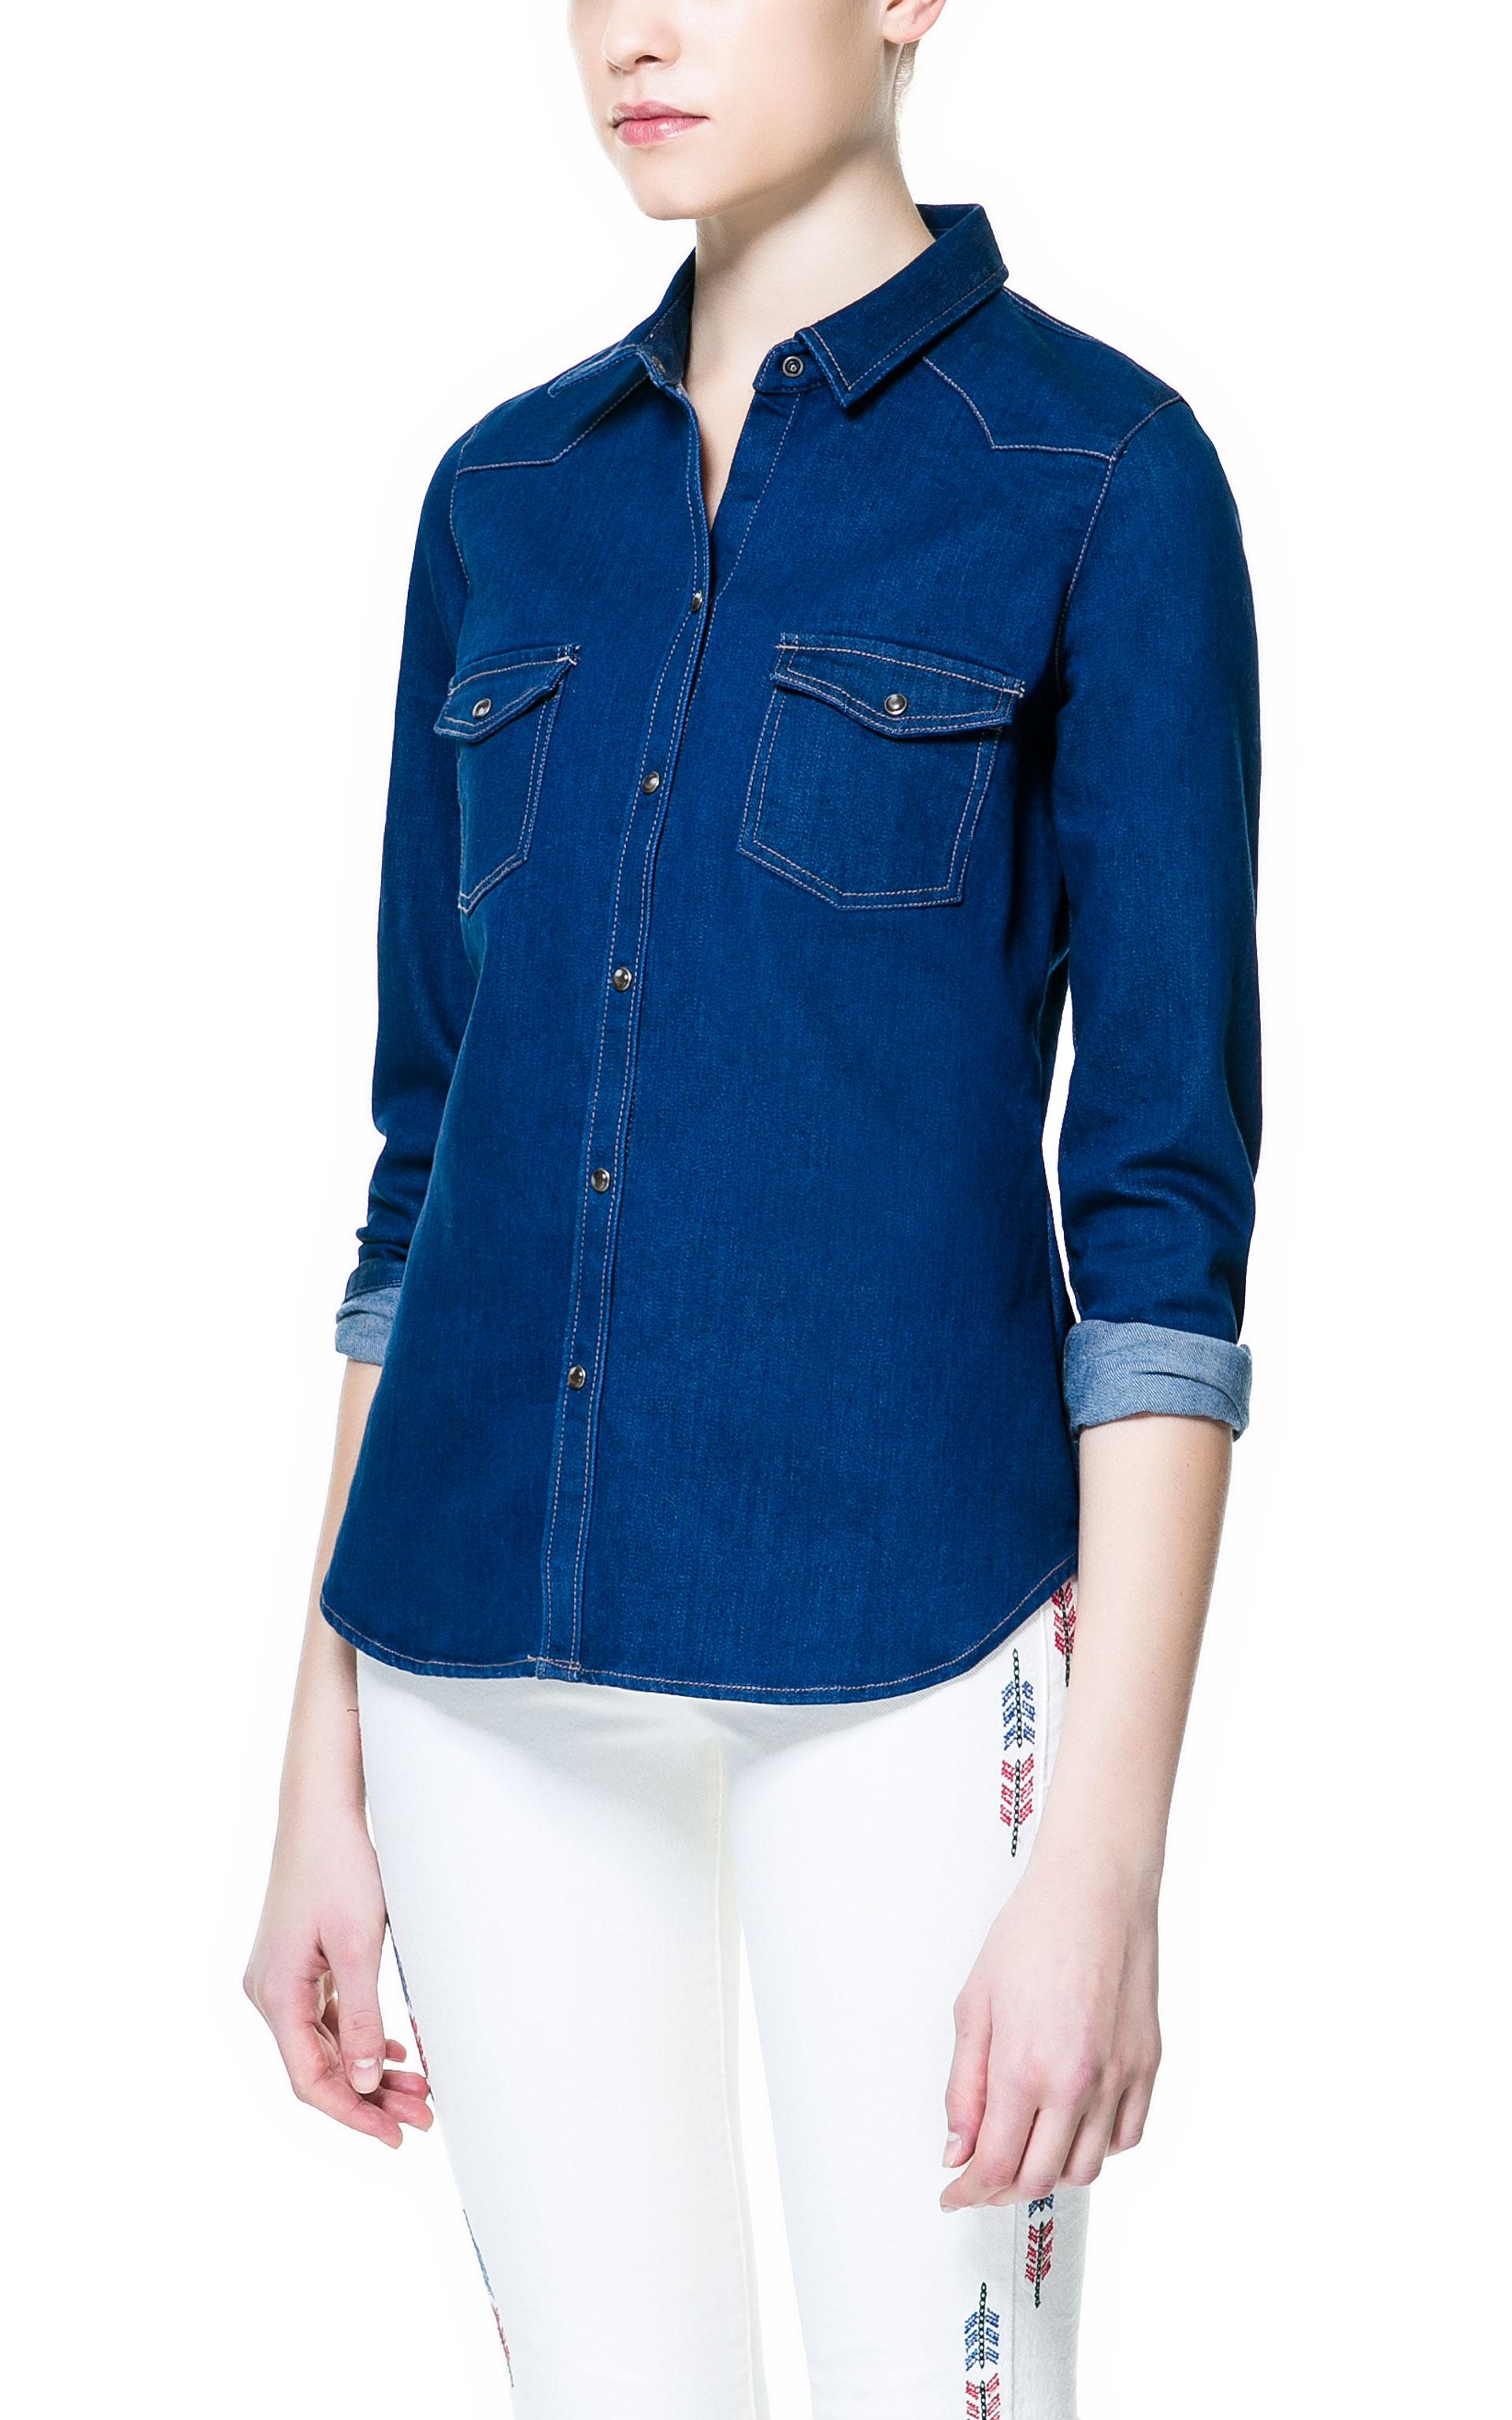 Zara denim shirt in blue lyst for Zara mens shirts sale